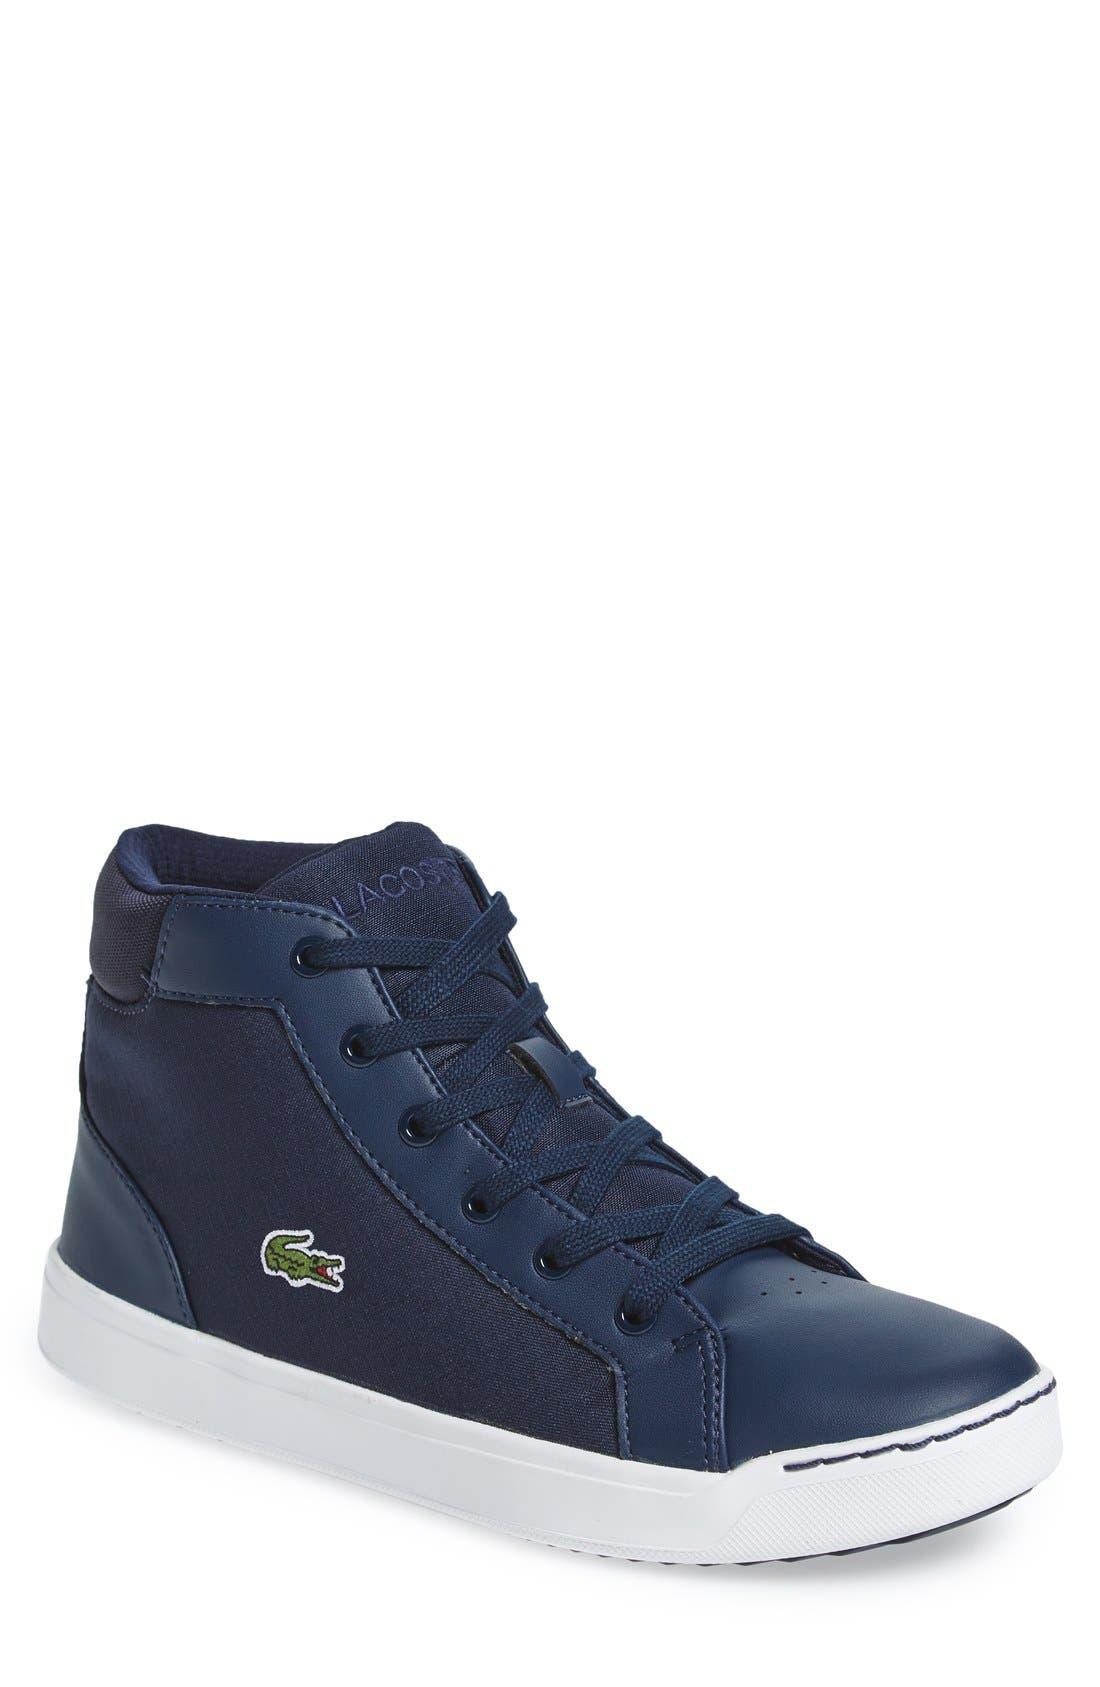 'Explorateur' Midi Sneaker, Main, color, 410